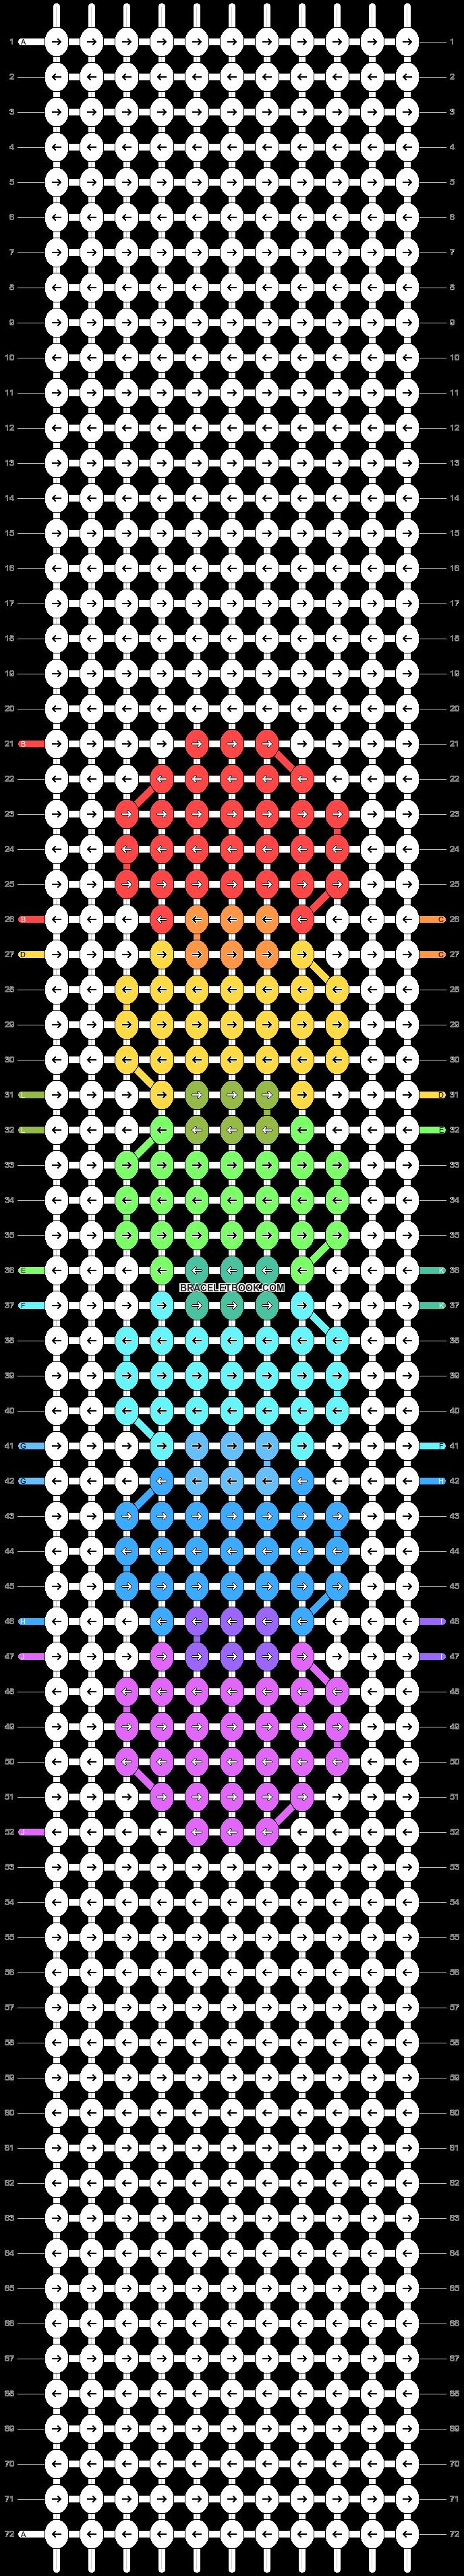 Alpha pattern #53311 pattern